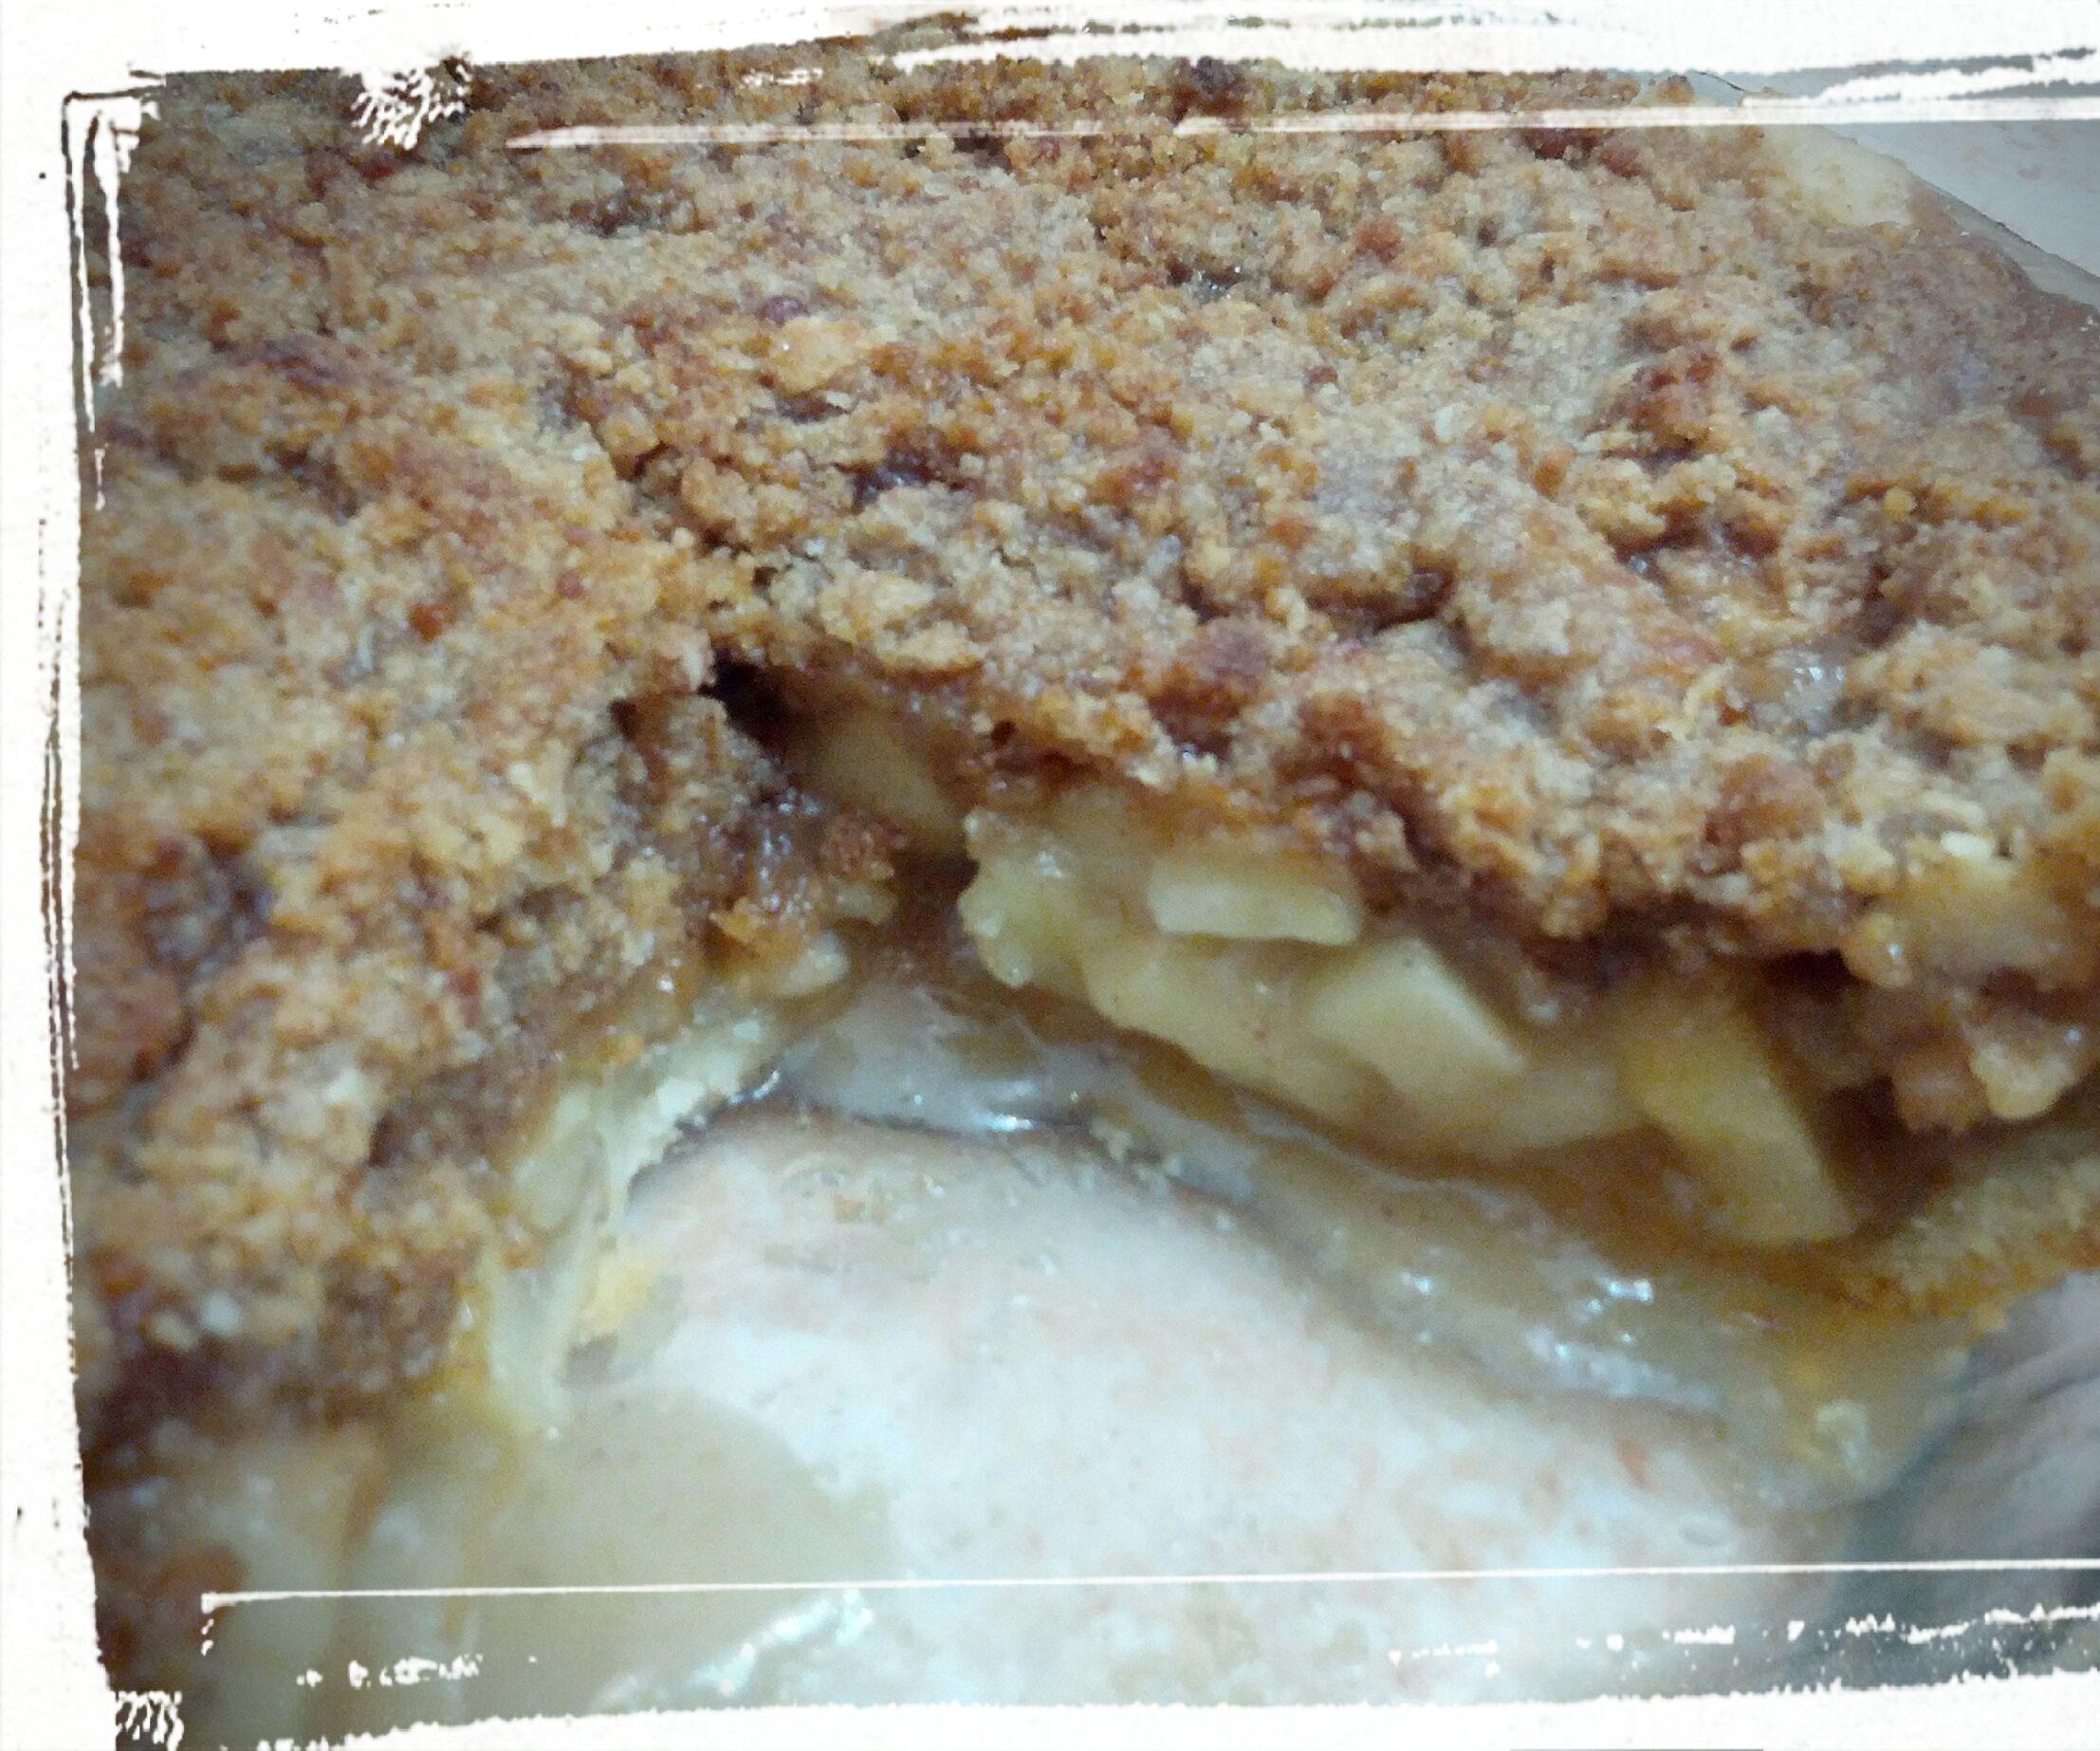 Penultimate Caramel Crumb Apple Pie